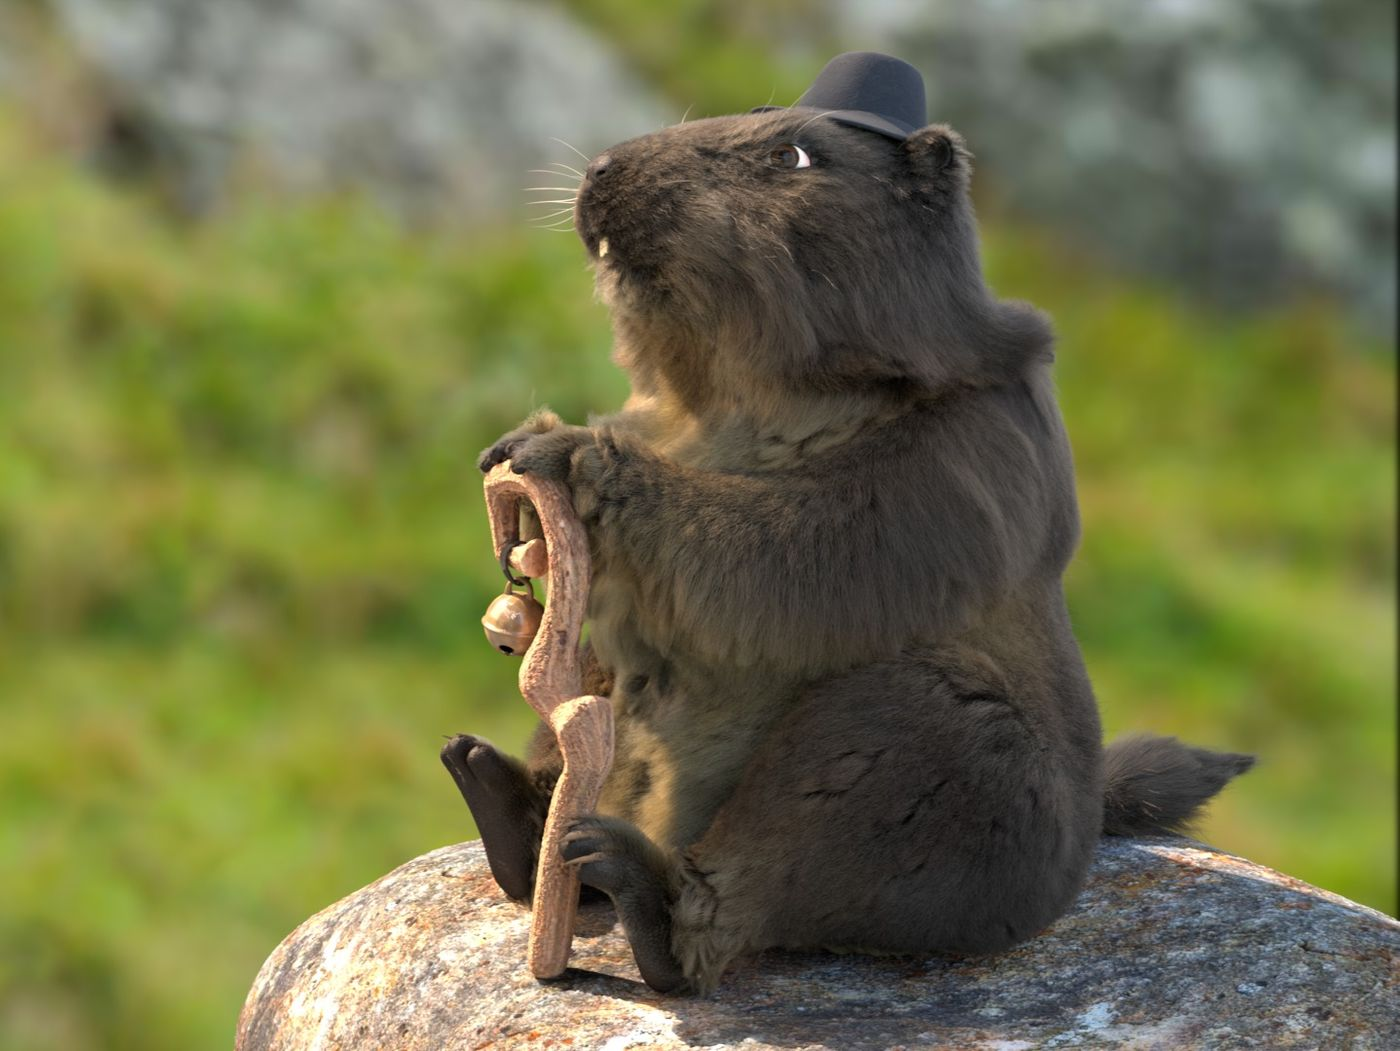 The marmot